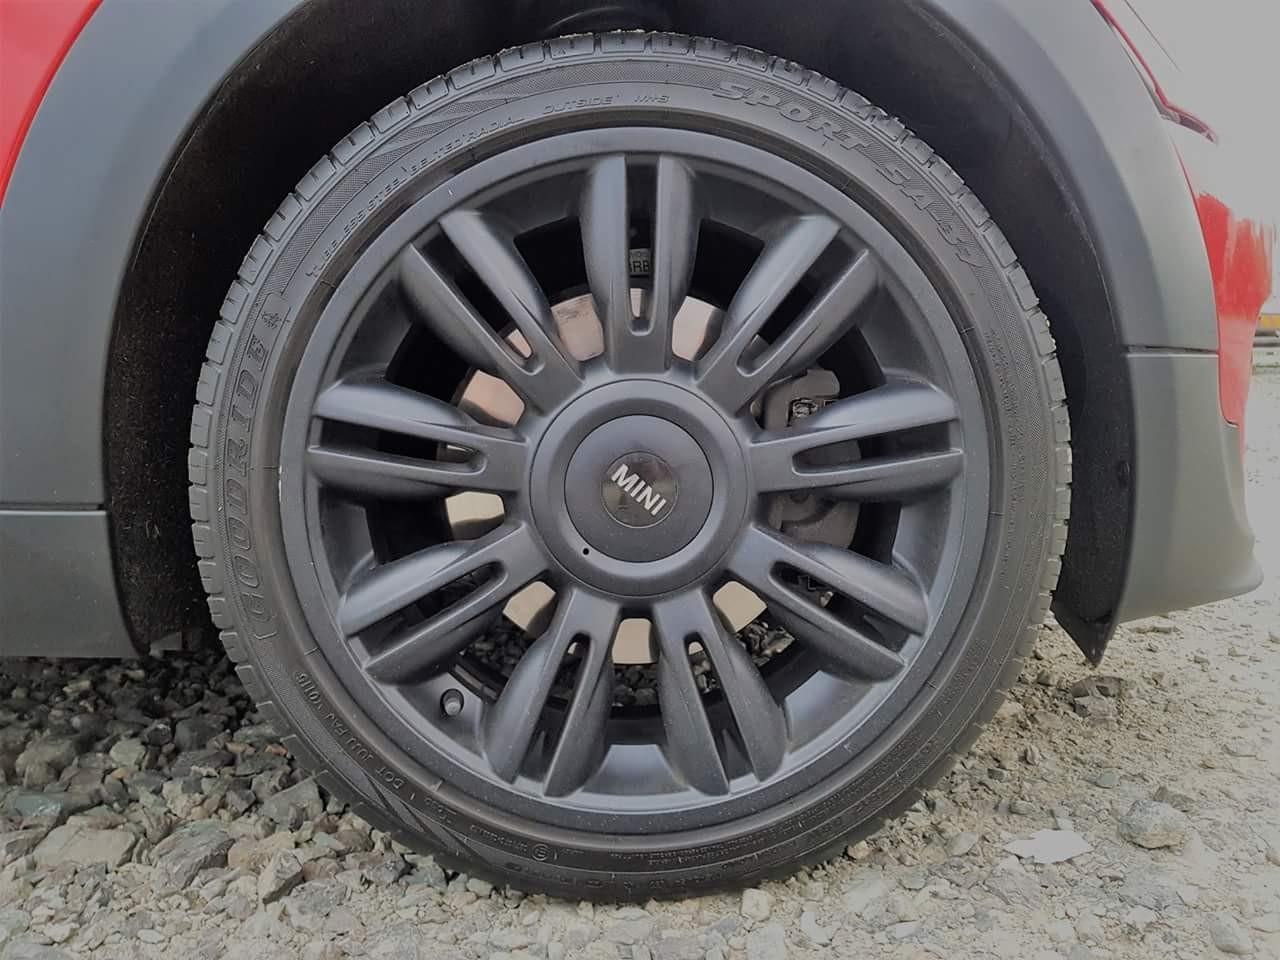 Mini Cooper S 1.6 turbo 2011